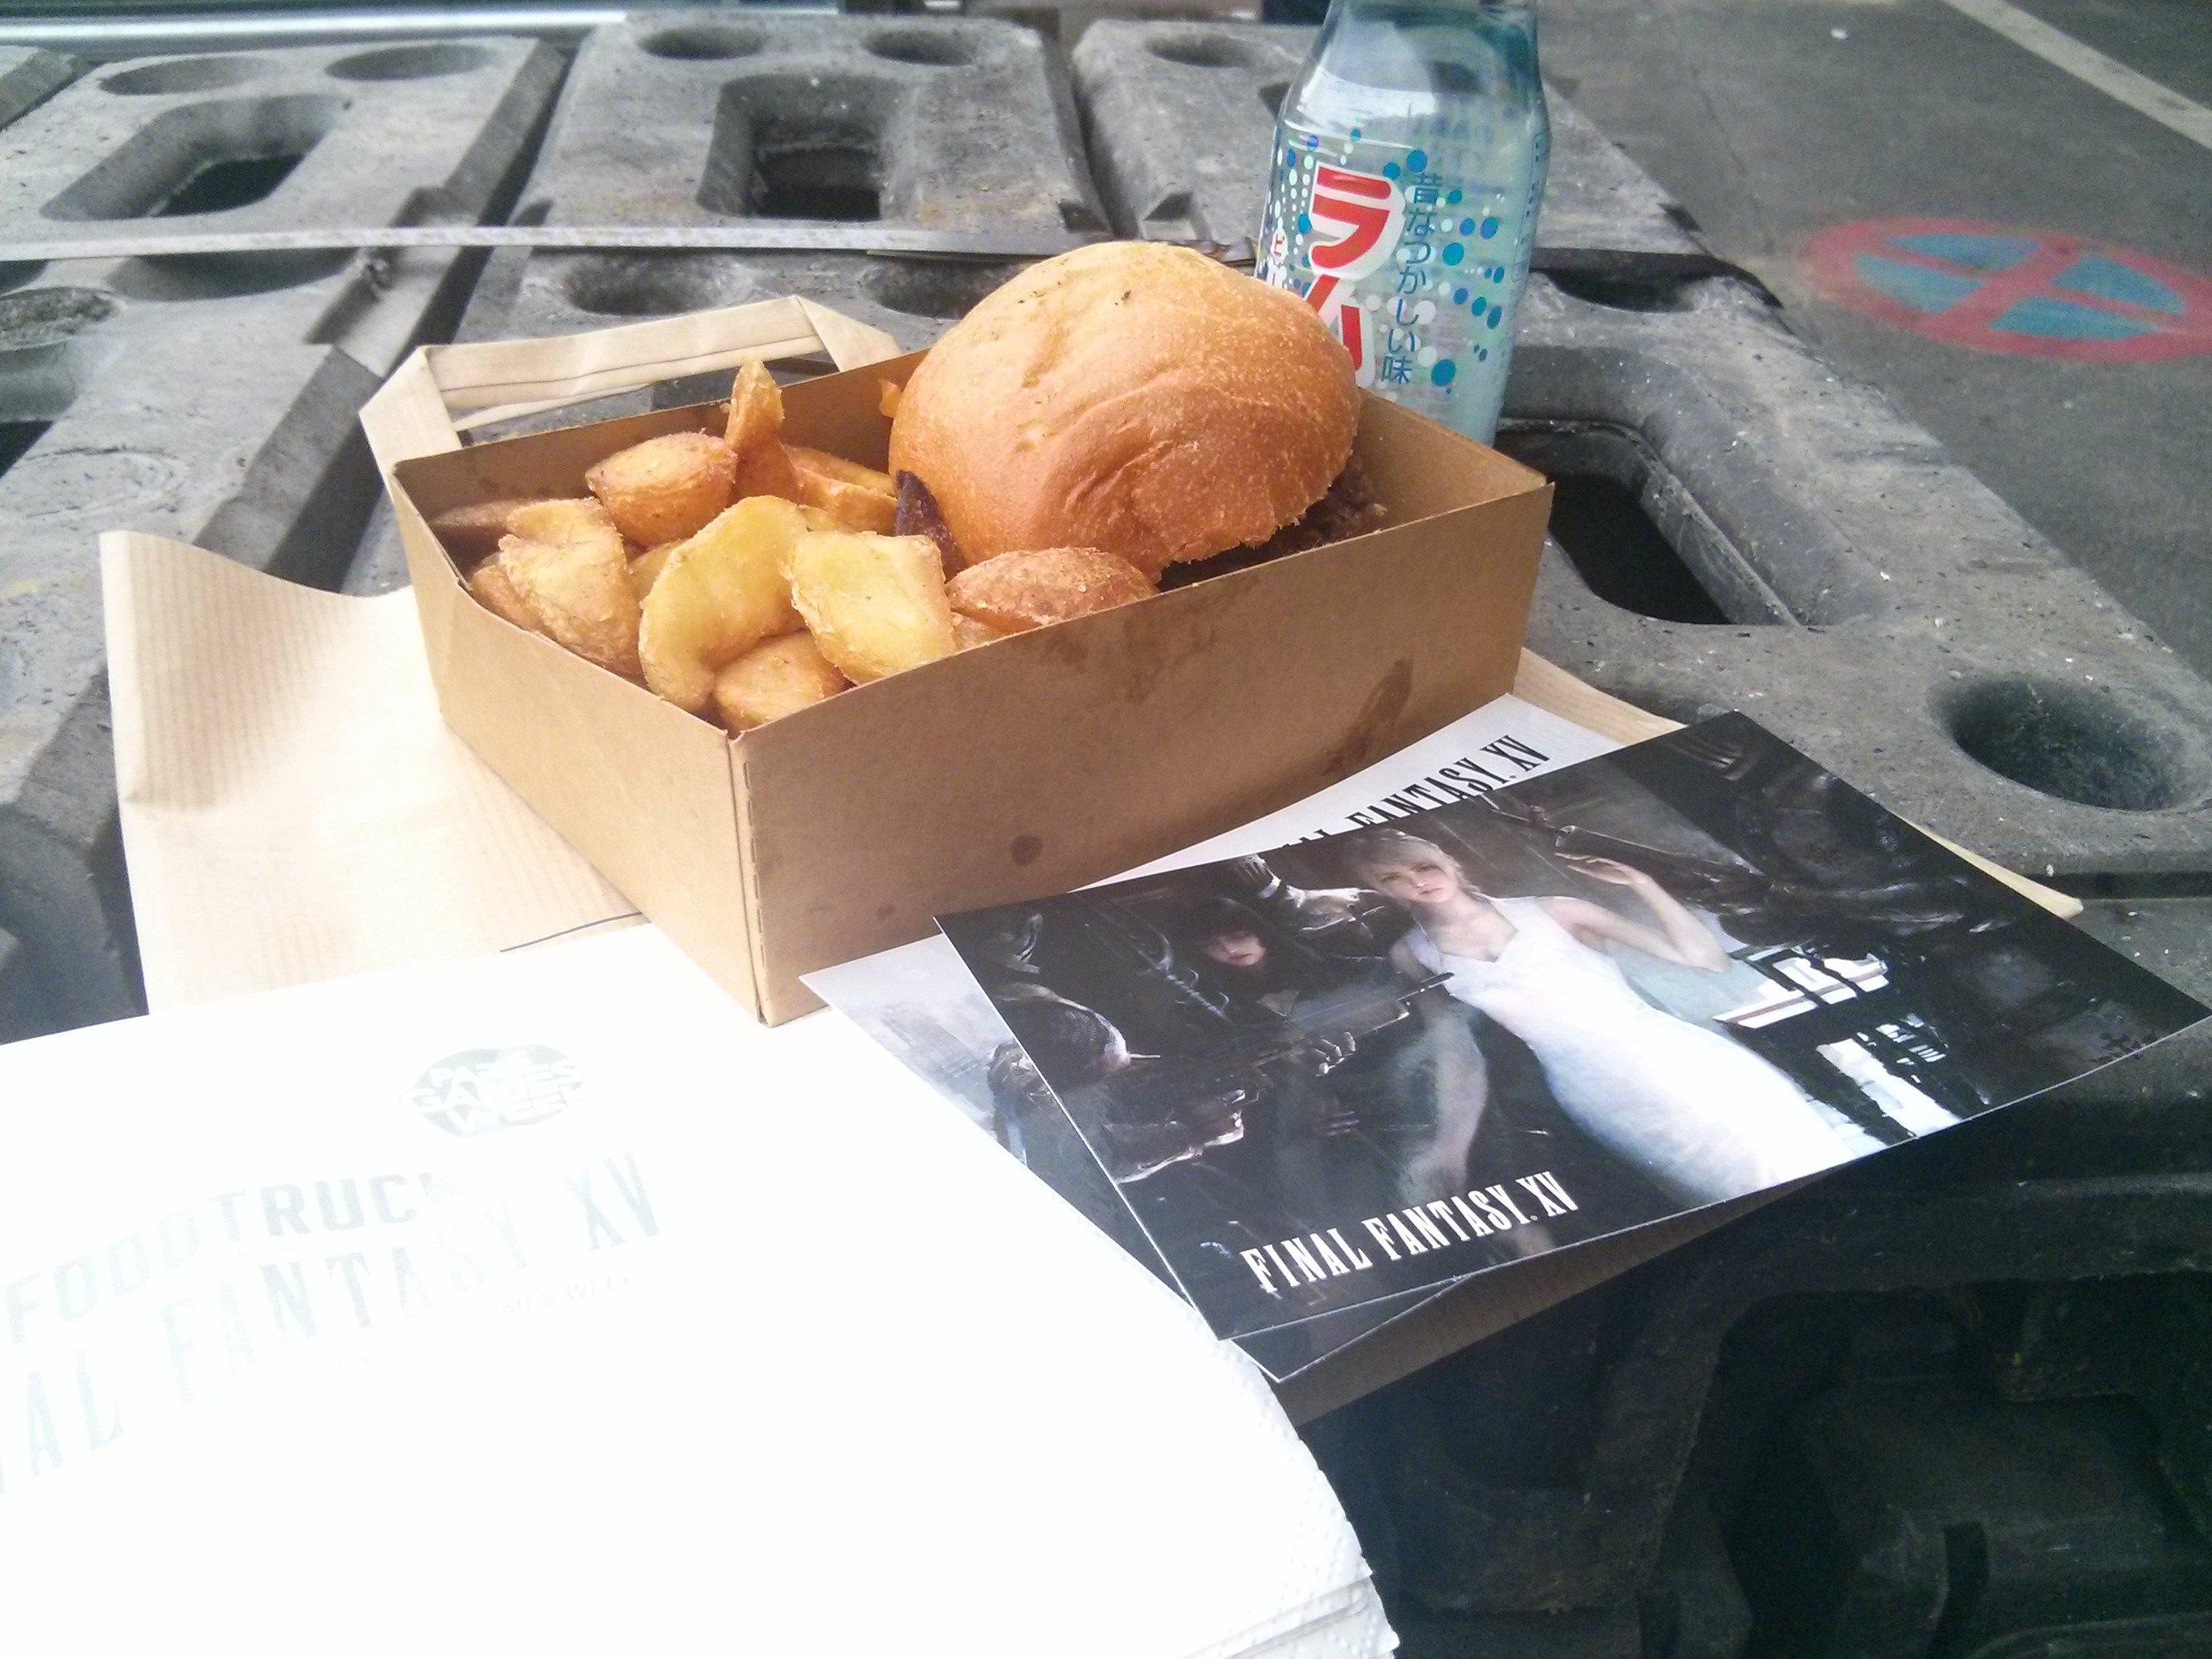 Final Fantasy XV Food Truck Serves Burgers 5